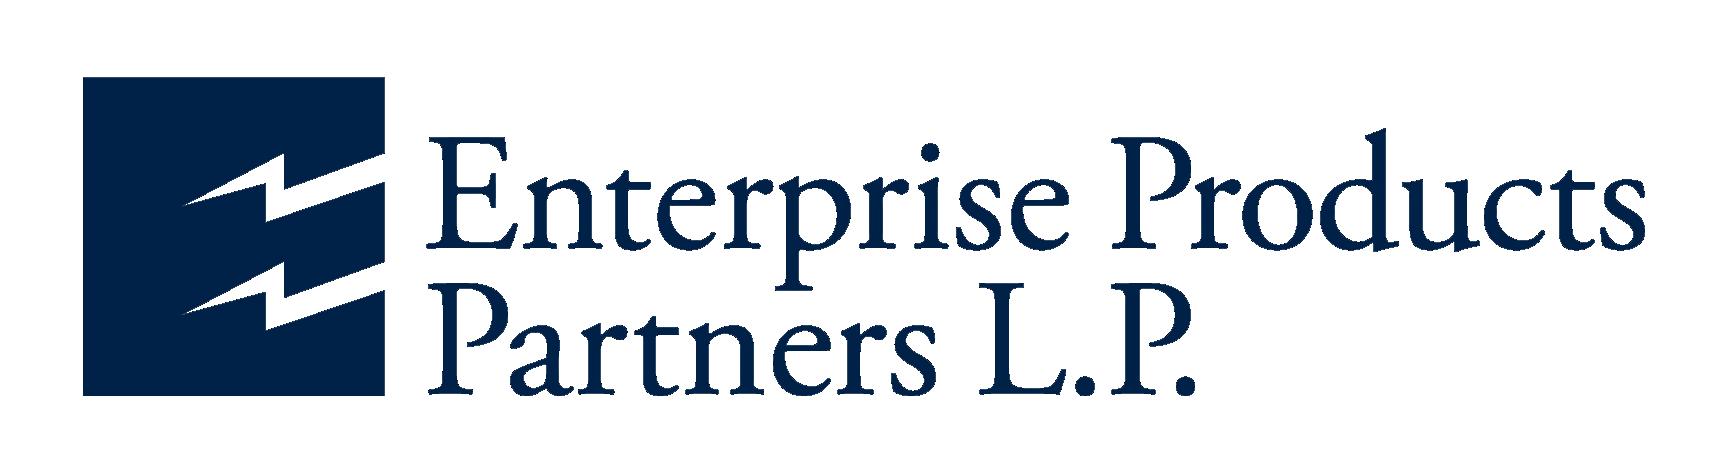 Enterprise Products Partners Logo